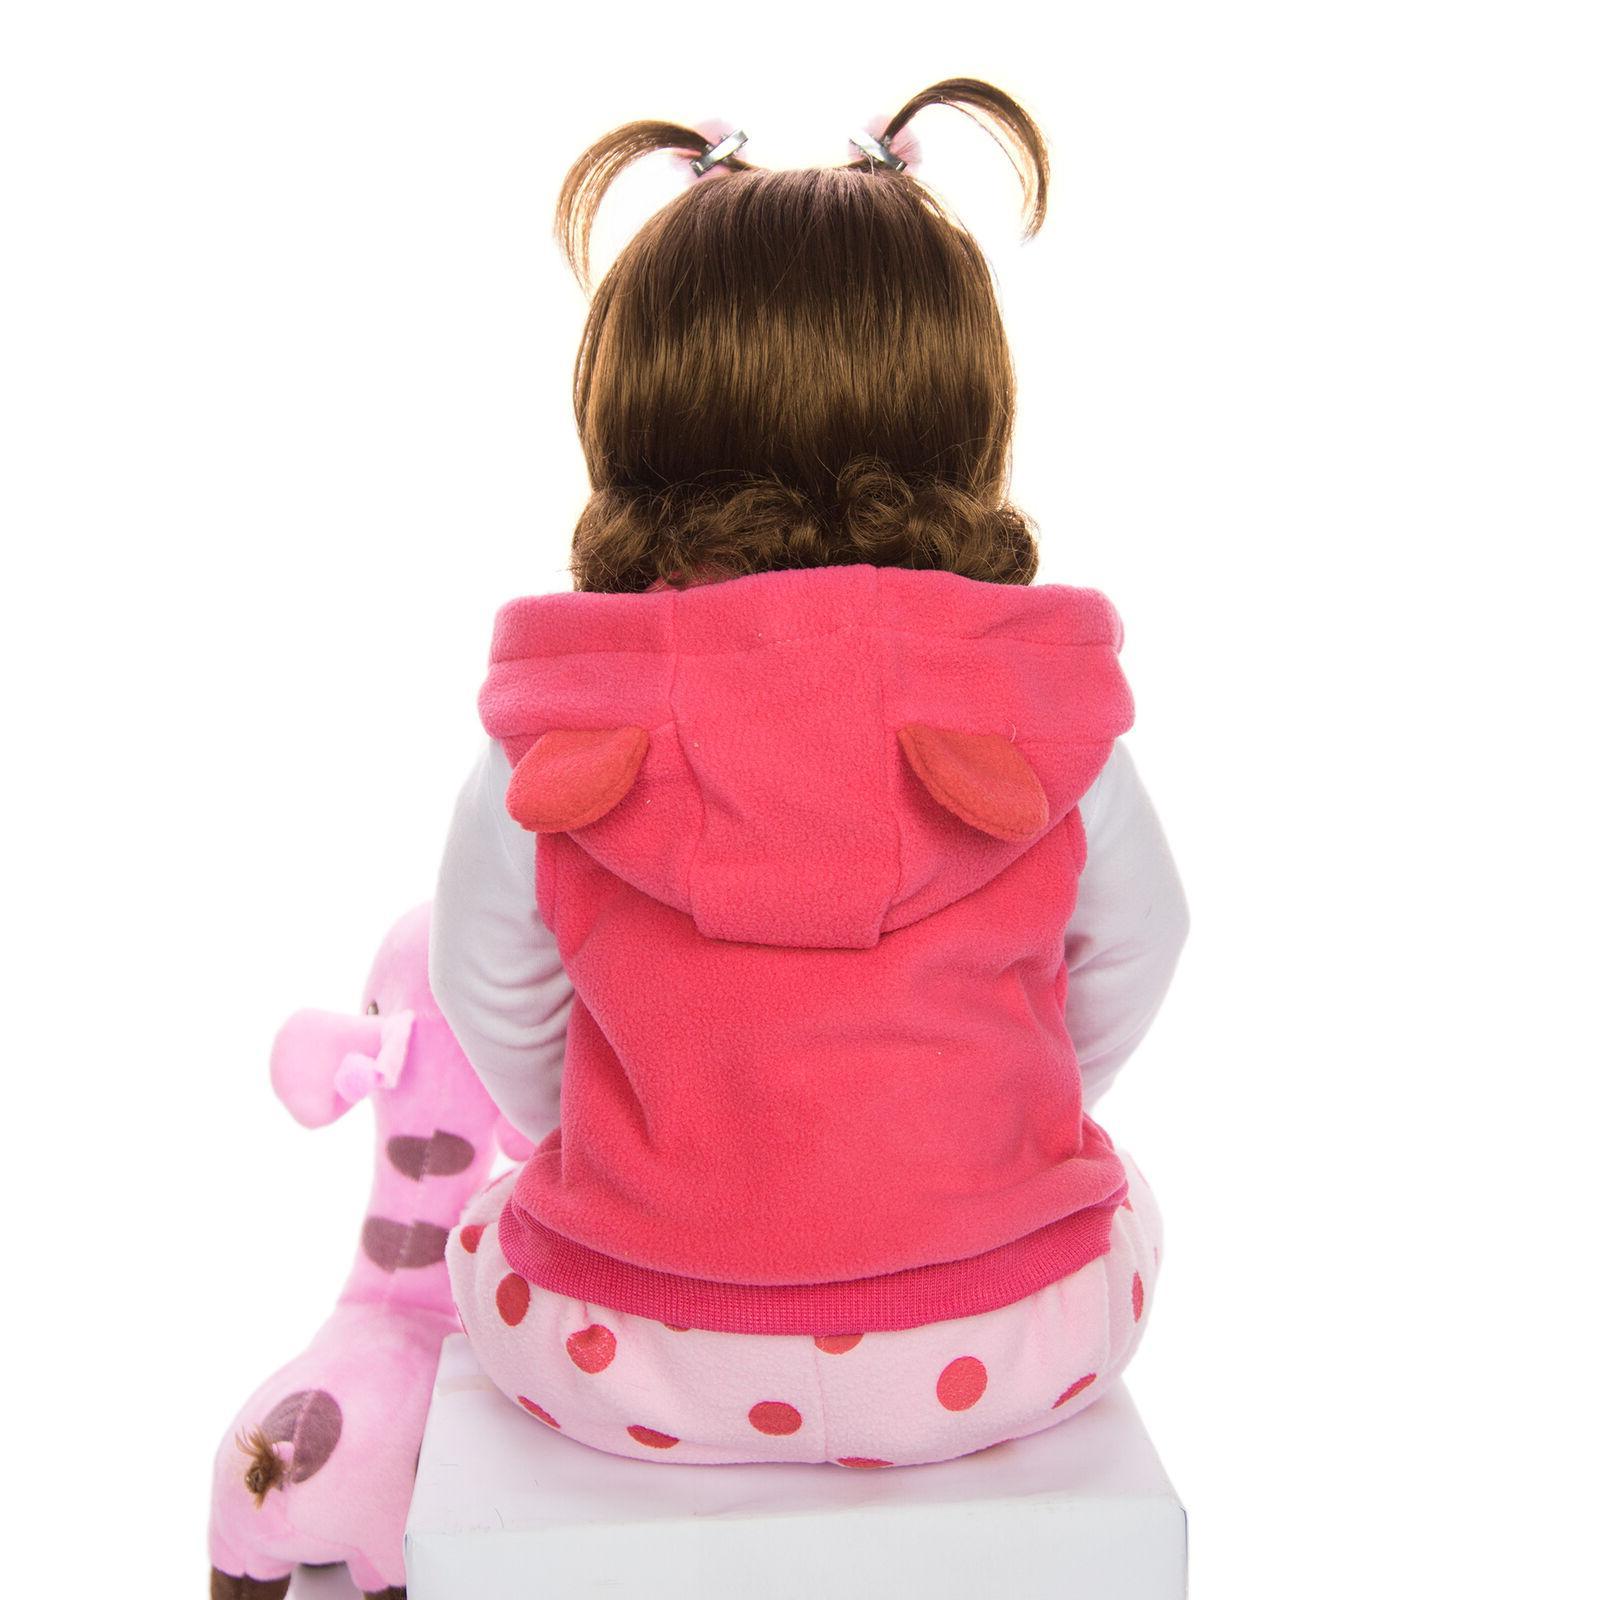 Reborn Baby Doll Toy Cloth Body Toddler